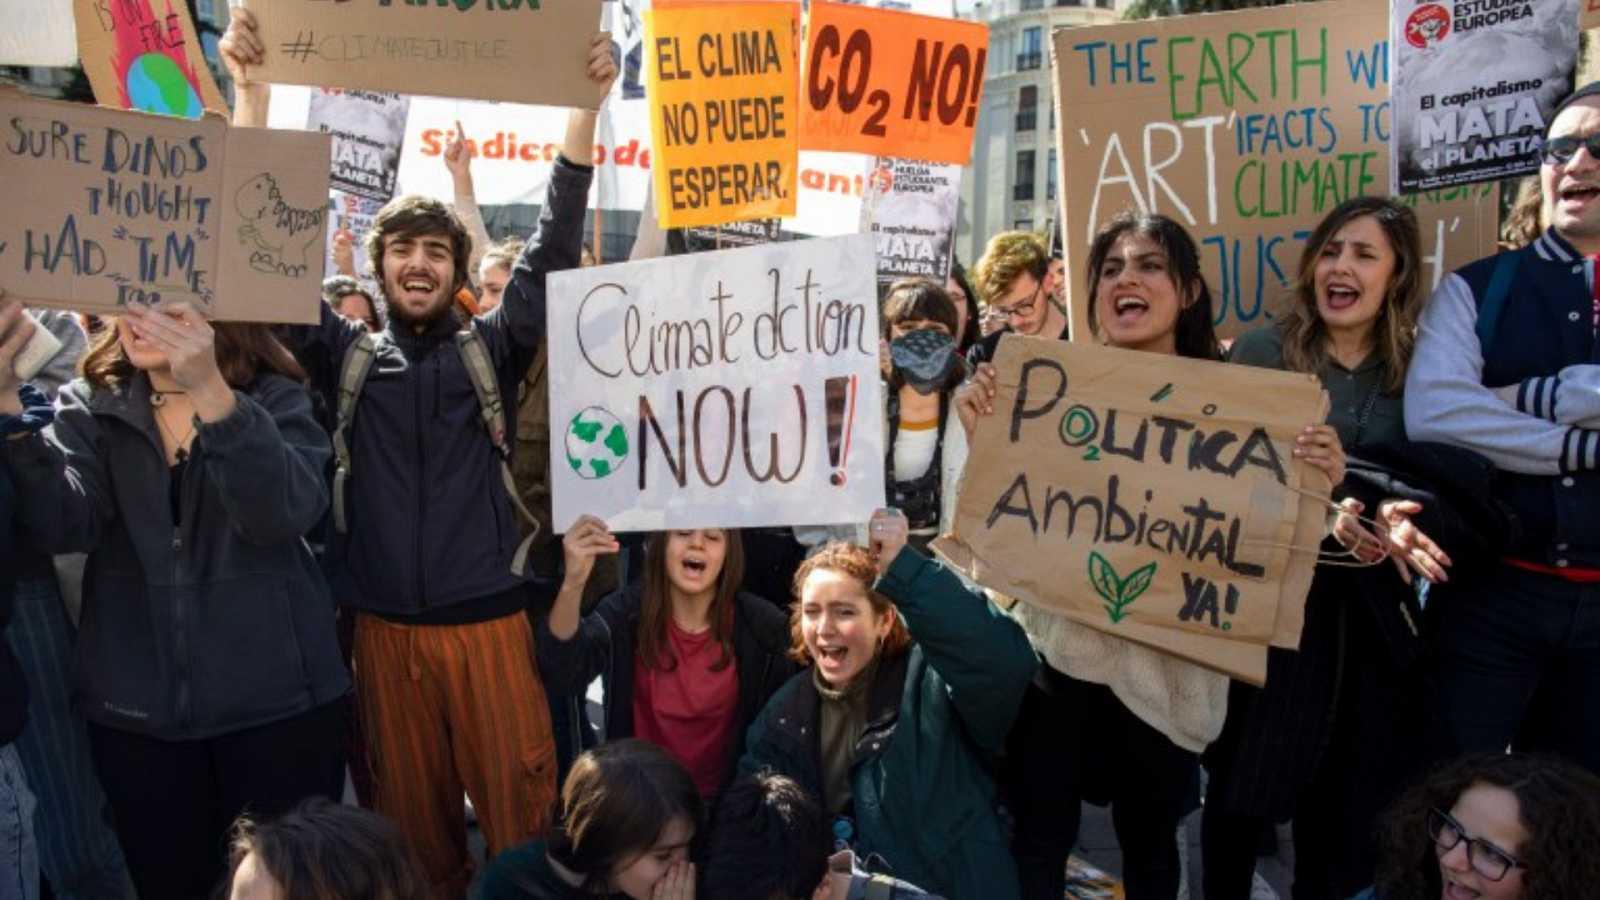 Reserva natural - Los jóvenes vuelven a llevar la batuta climática - 18/03/21 - Escuchar ahora